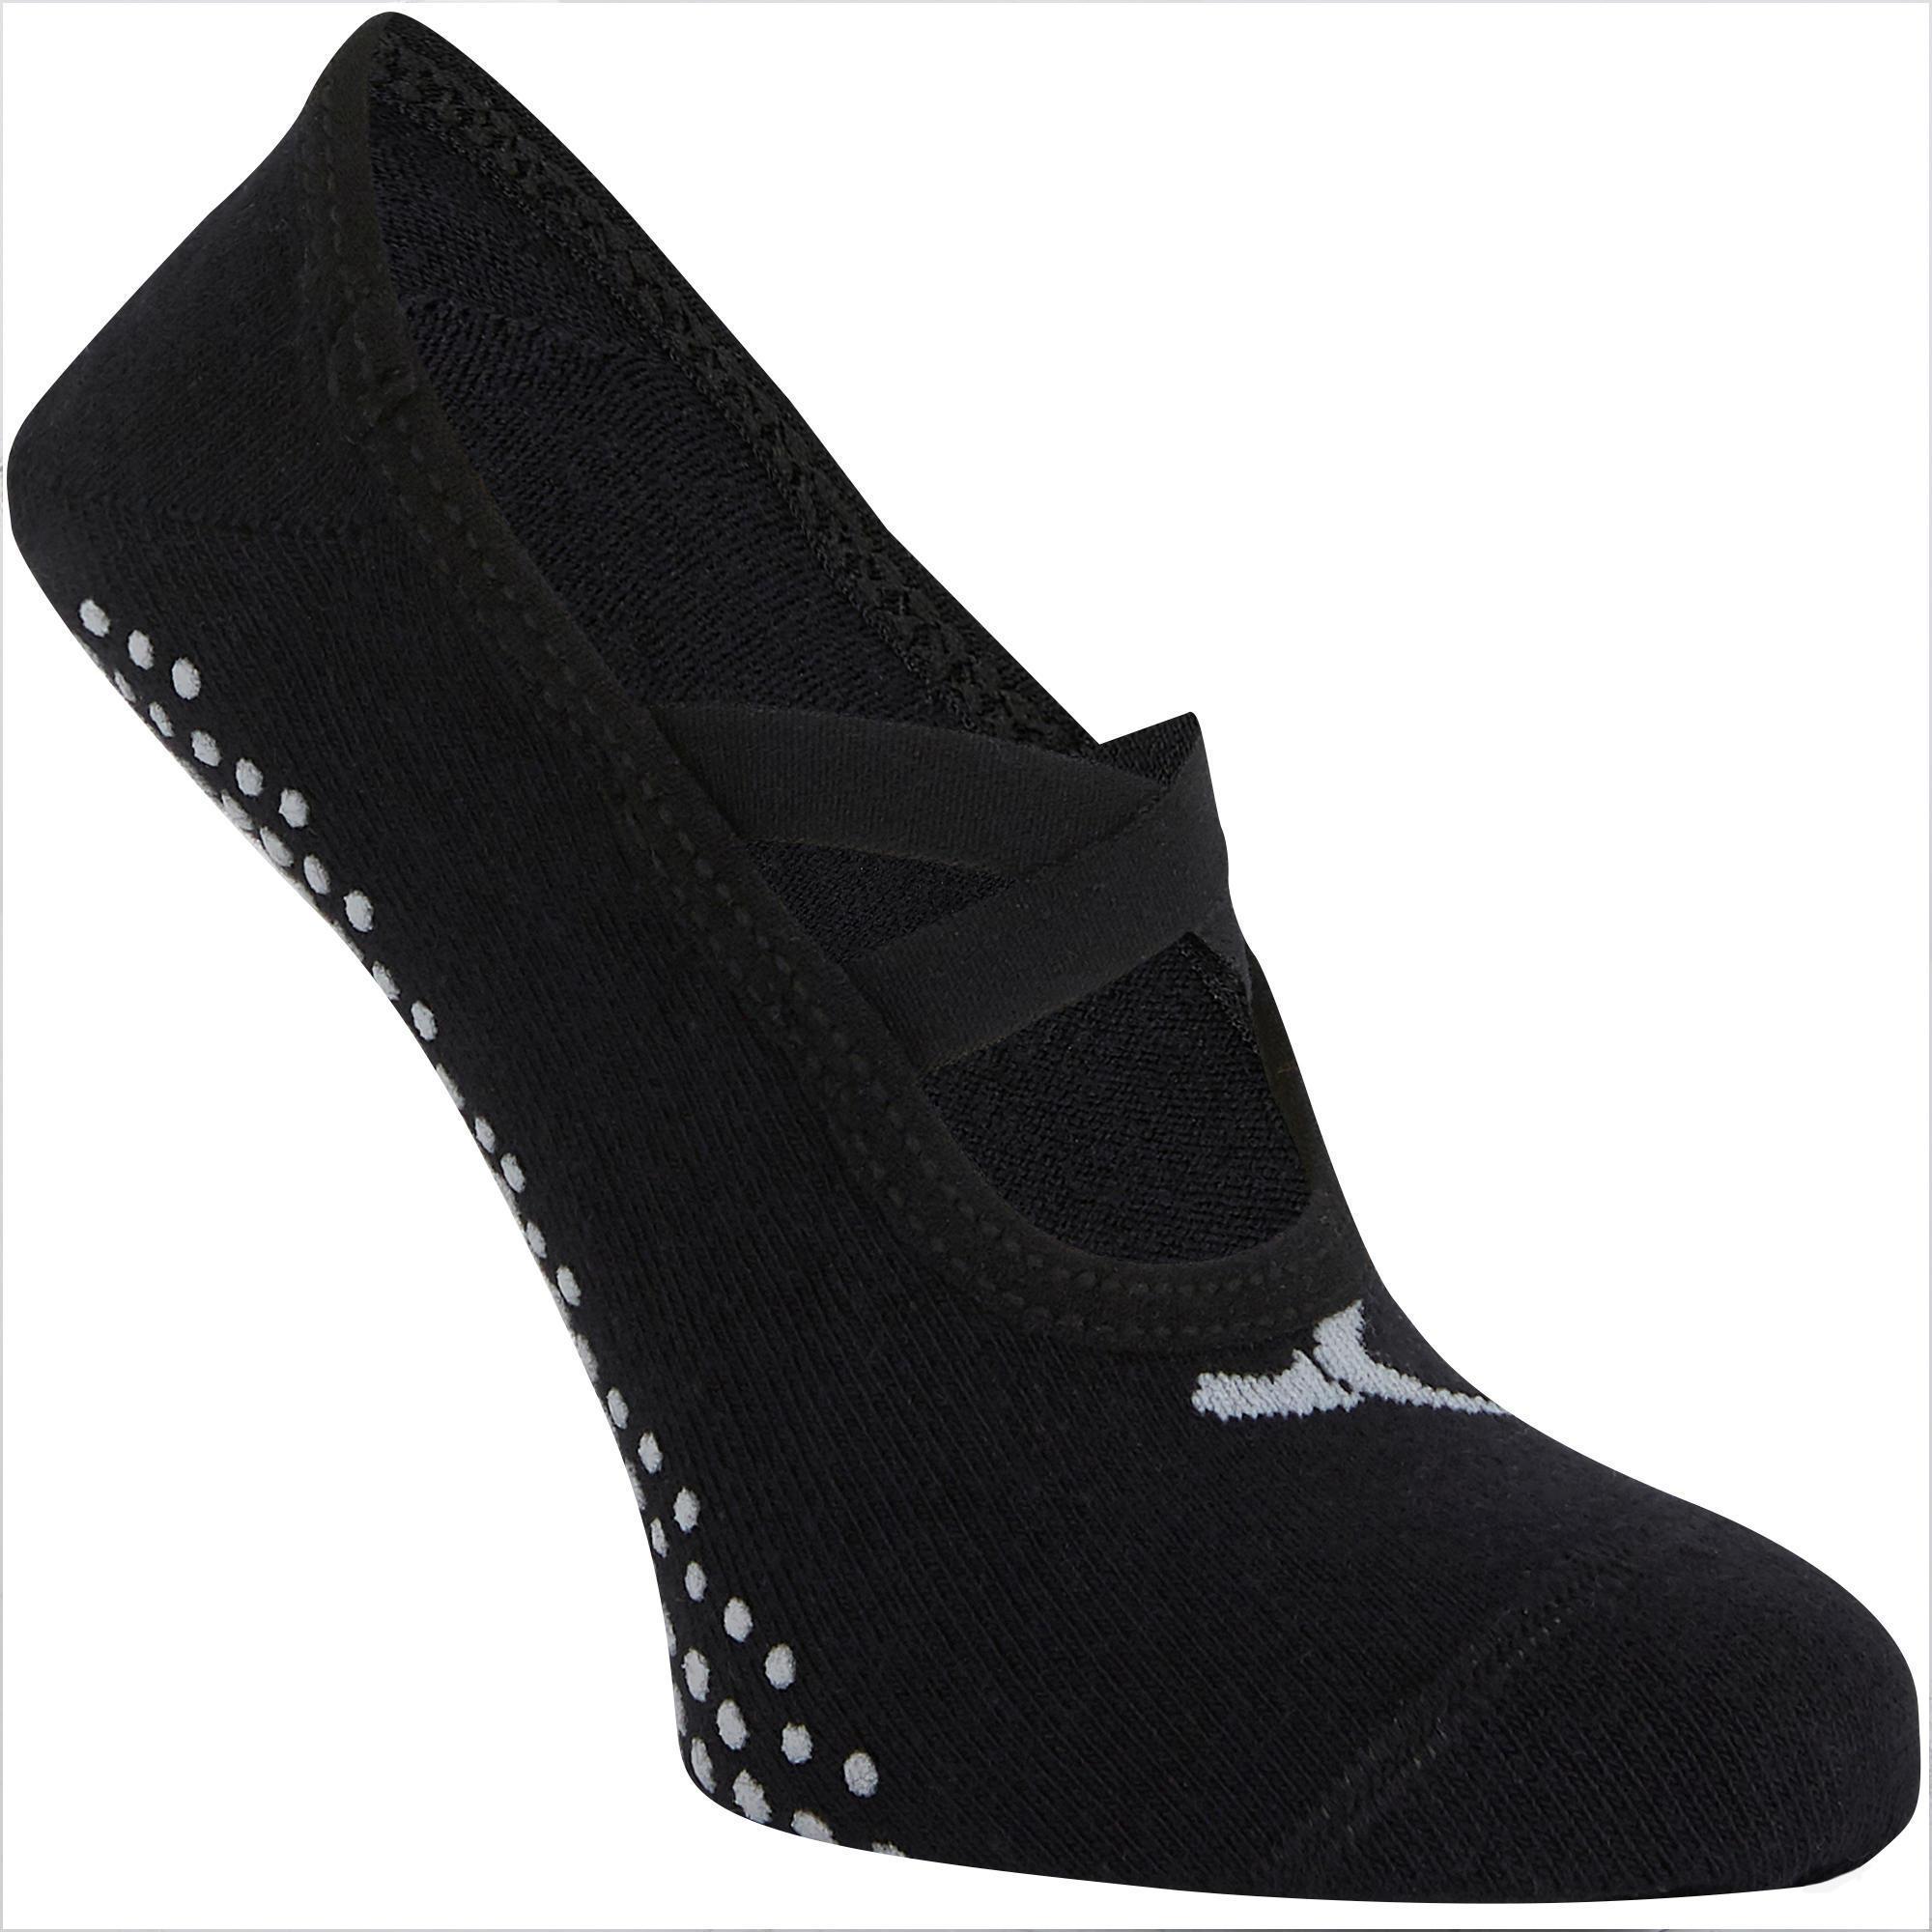 sale retailer ddbc4 8ec23 Abbigliamento donna - Calze antiscivolo donna gym pilates 500 nere